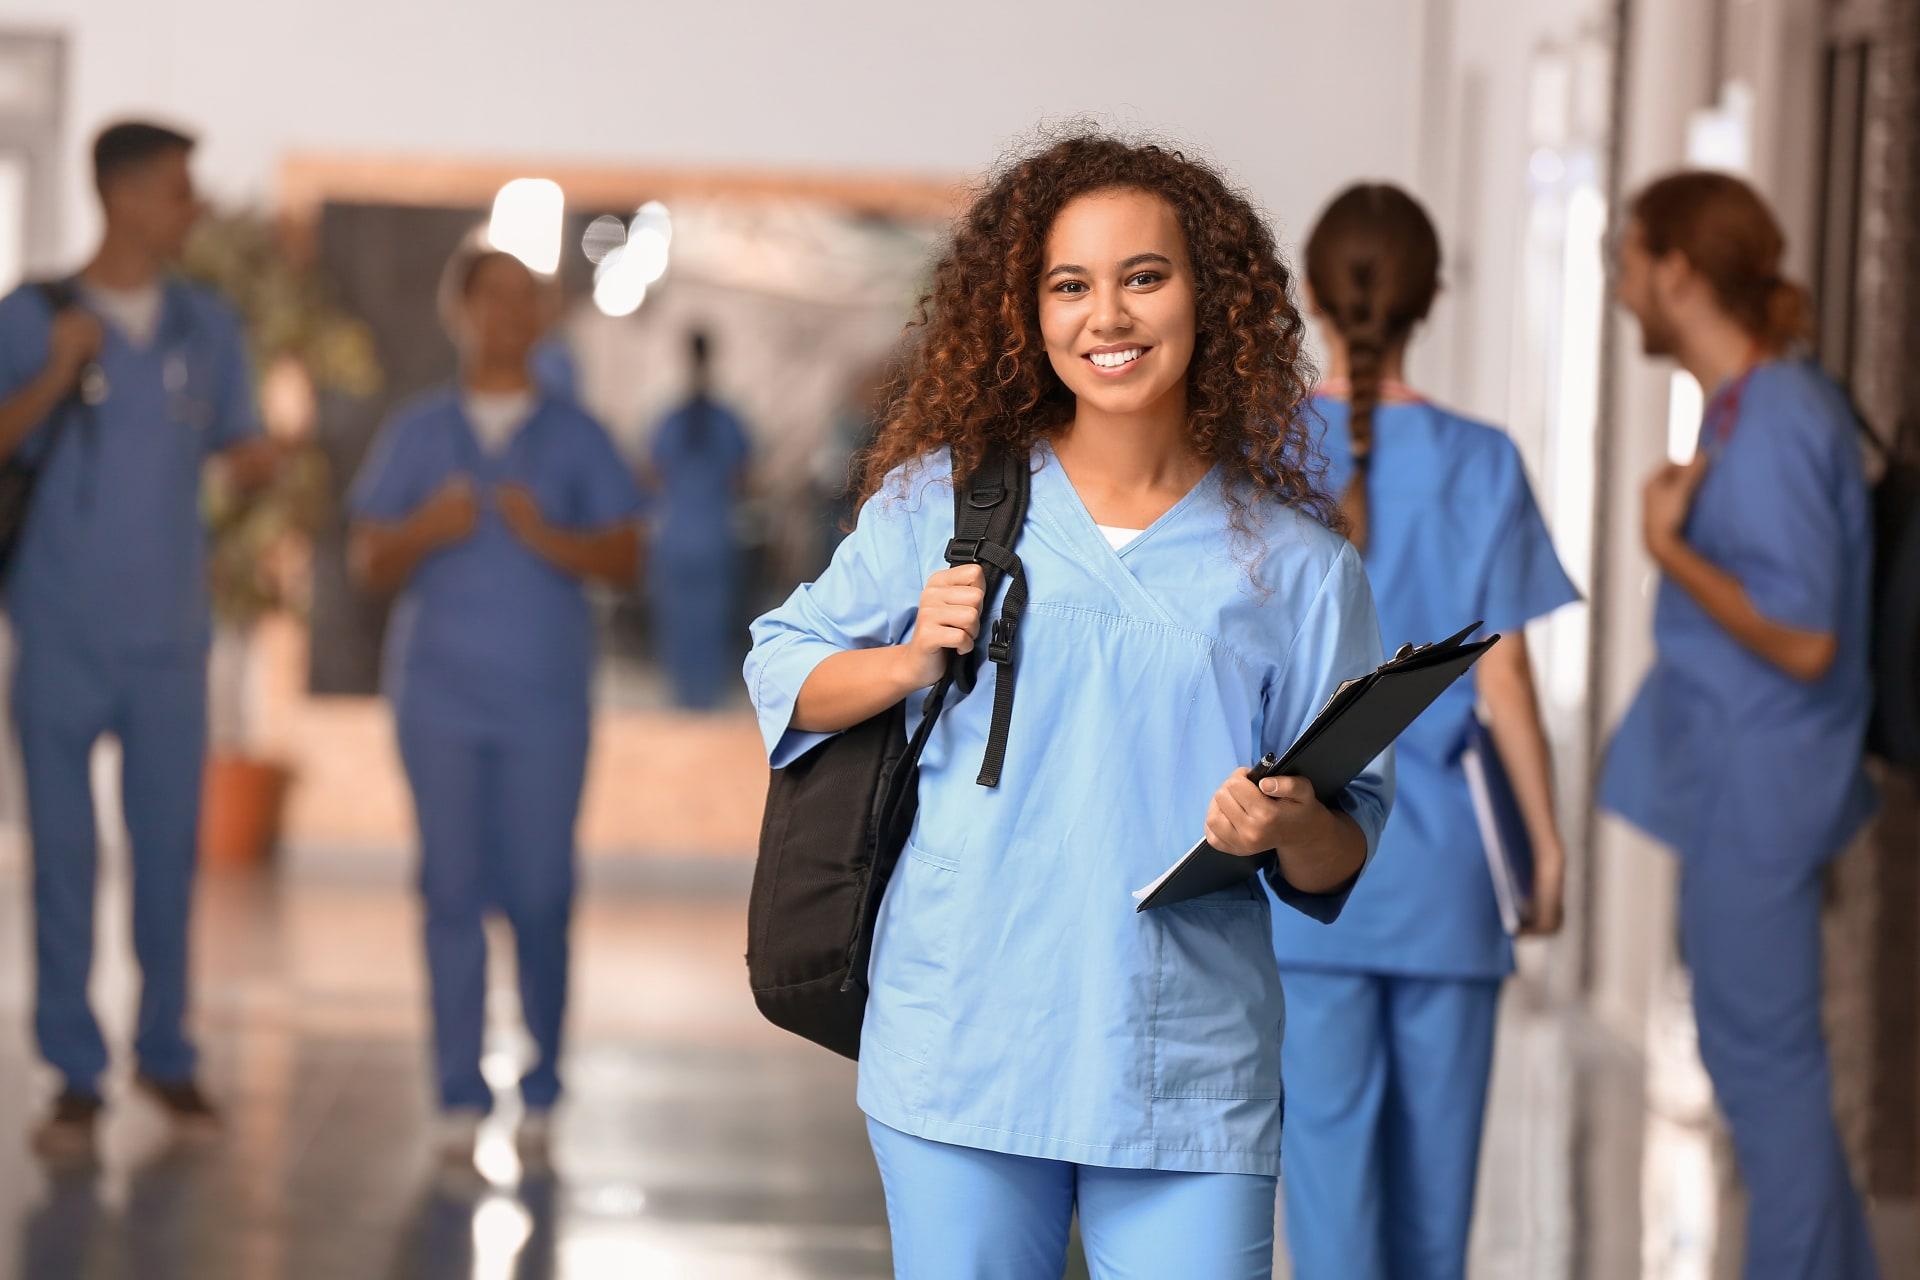 Deployment of final year student nurses